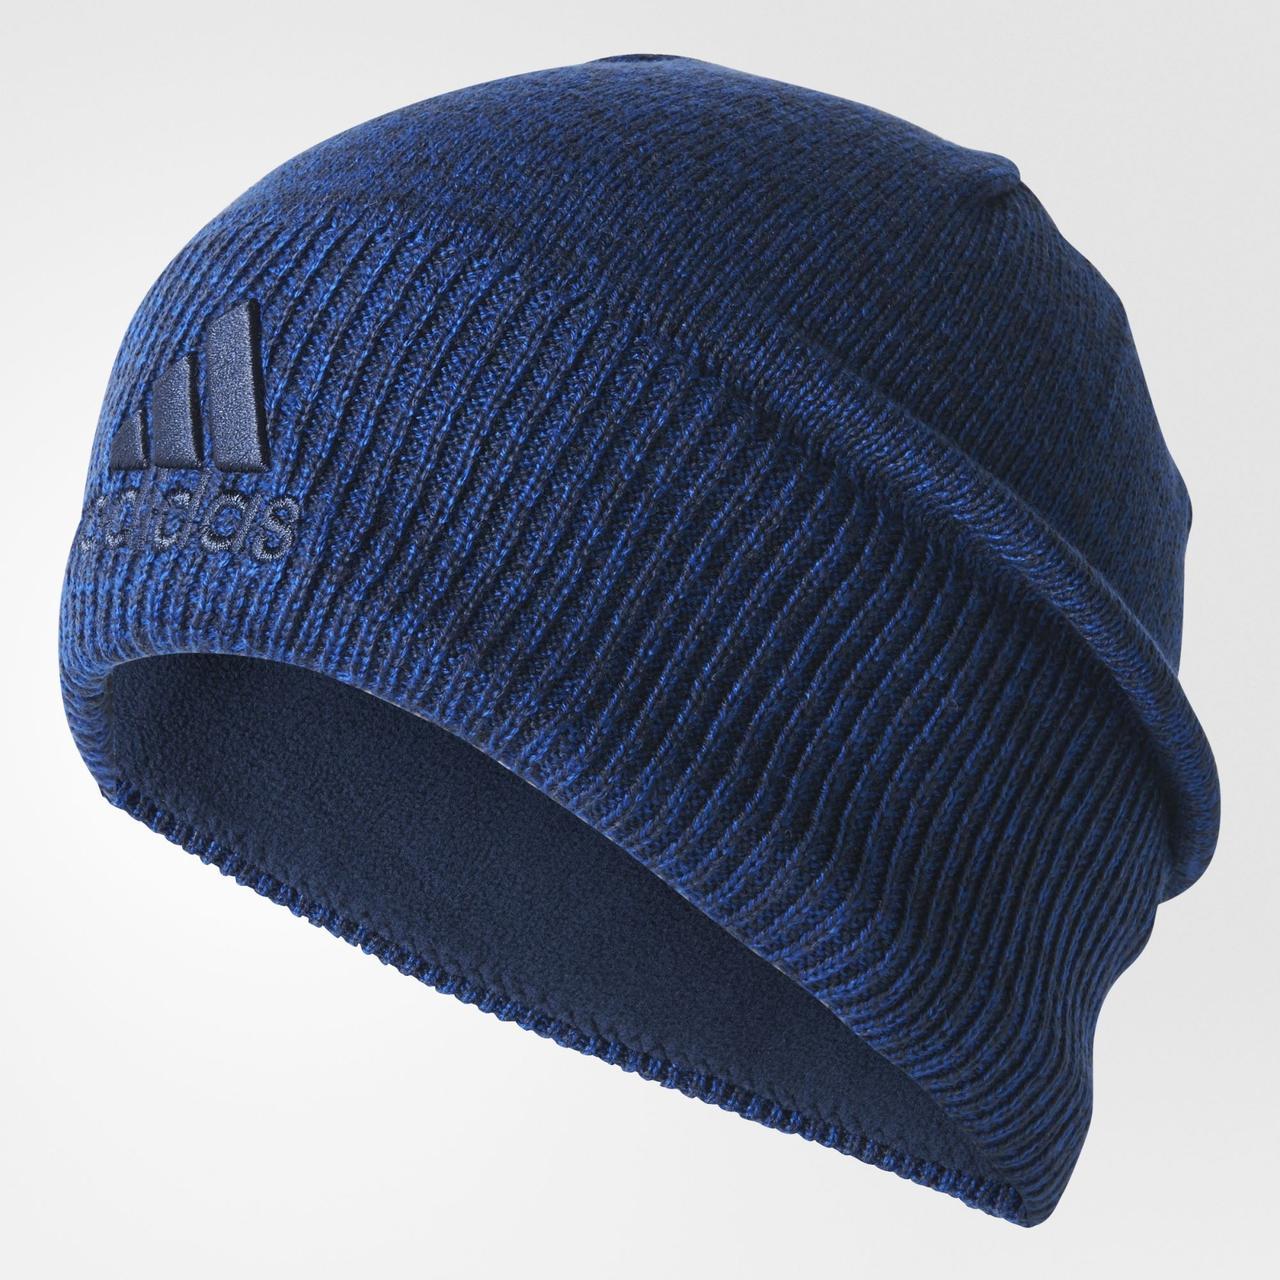 Купить Шапка Adidas Performance Z.N.E. Climawarm (Артикул  CD1611) в ... 238639adc17be